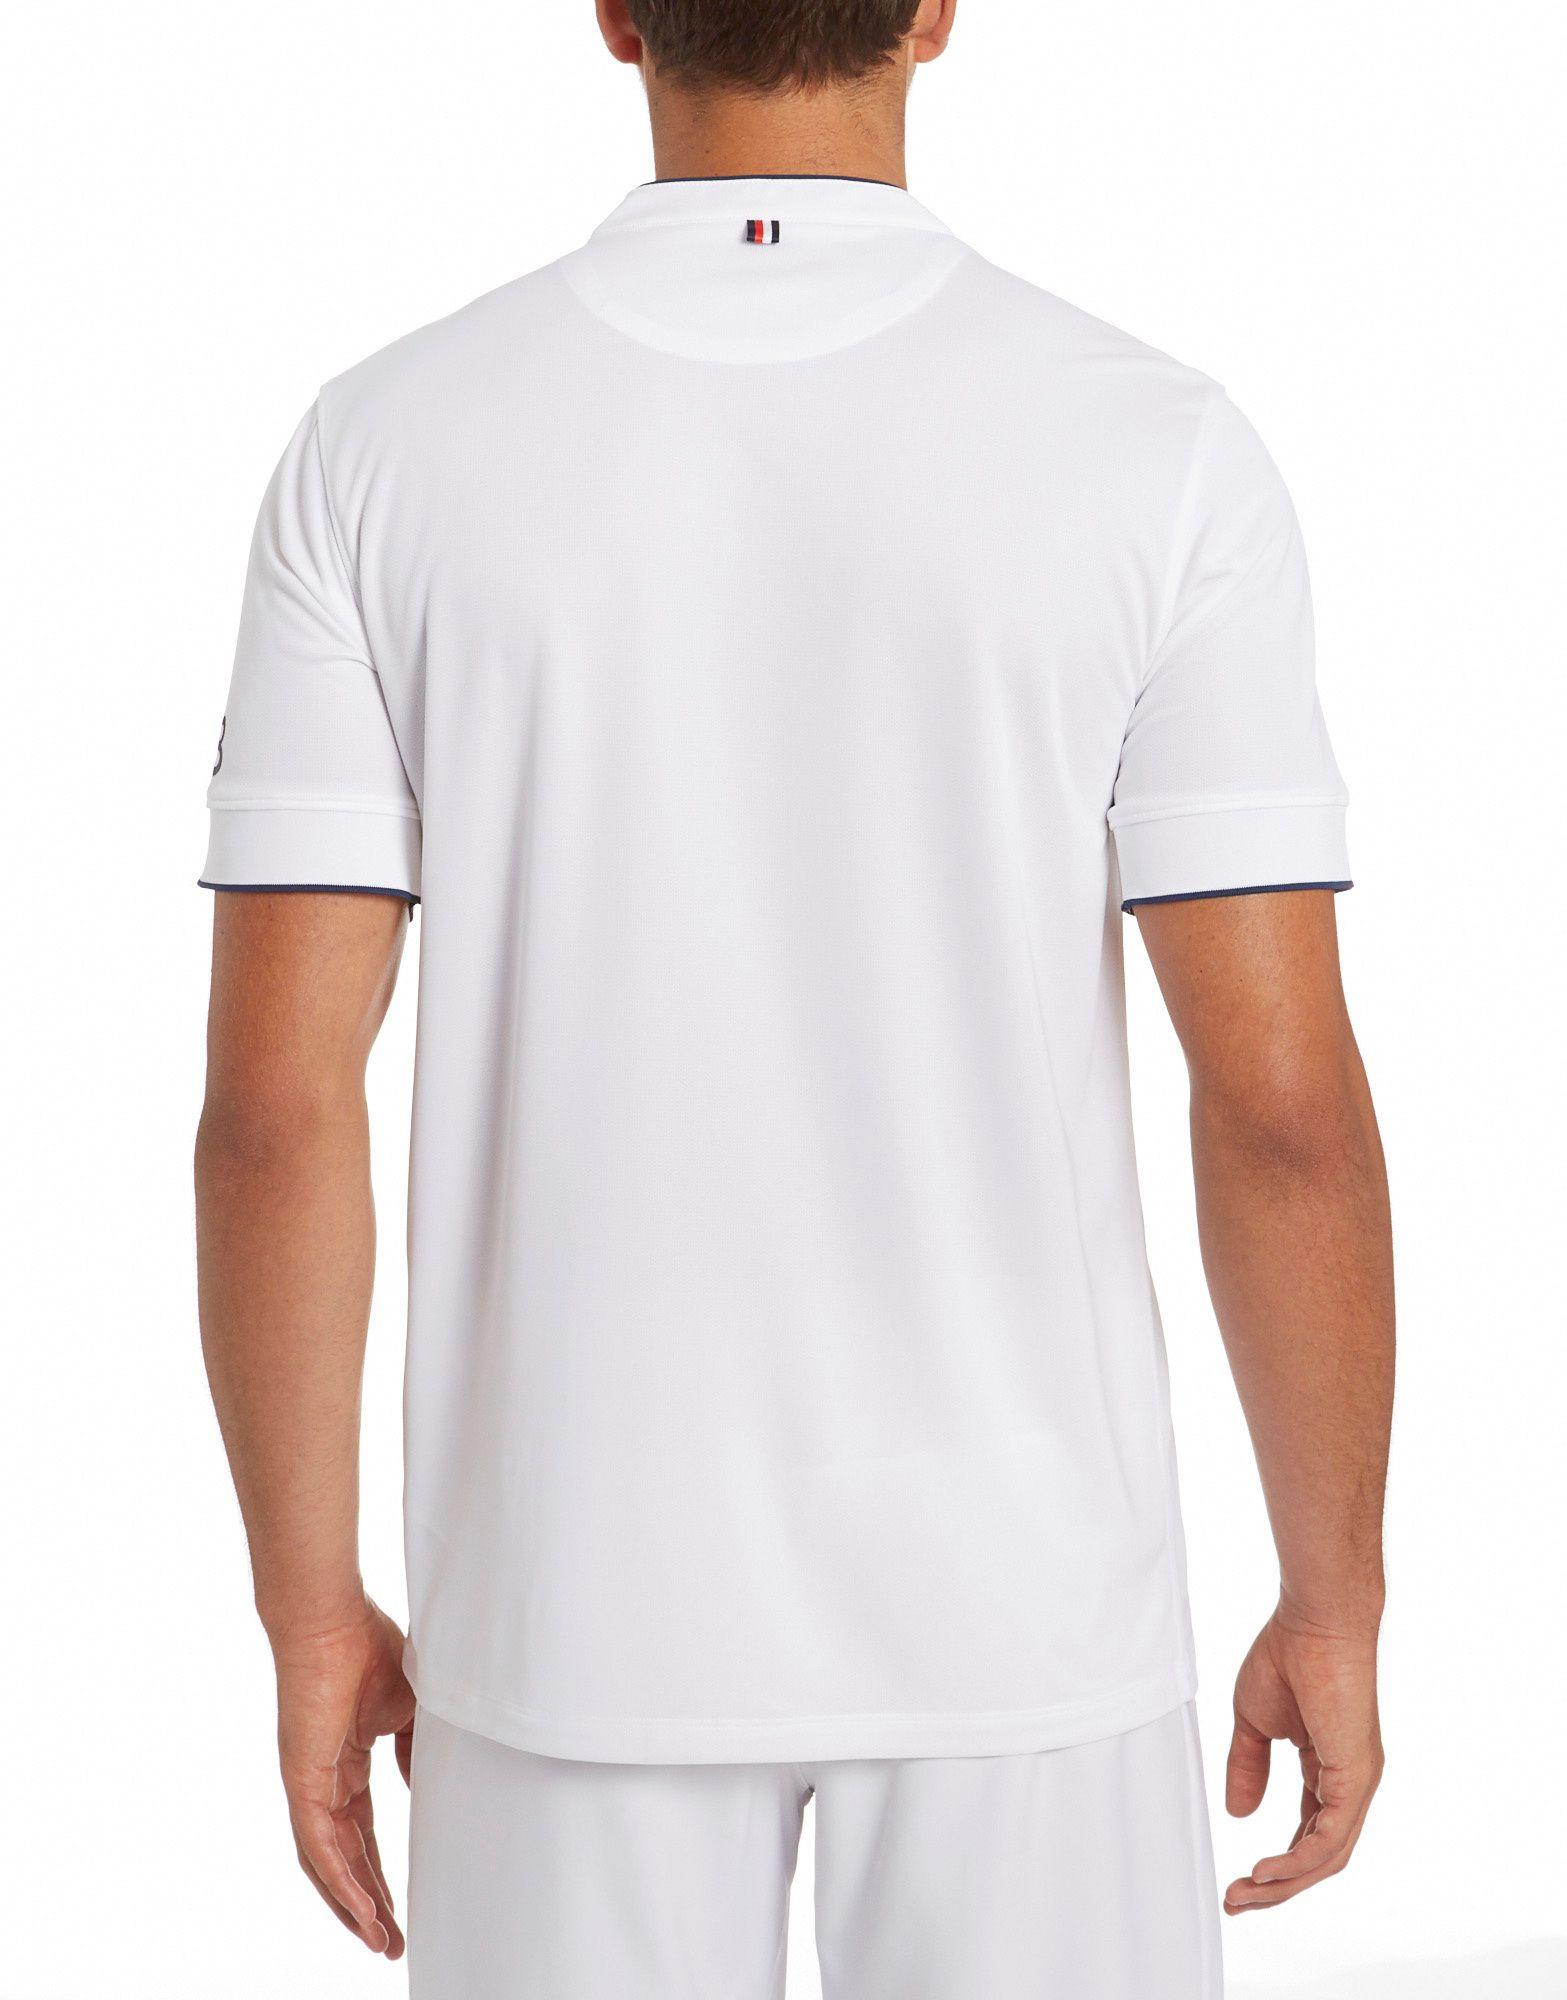 Nike Paris St Germain 2014 Away Shirt